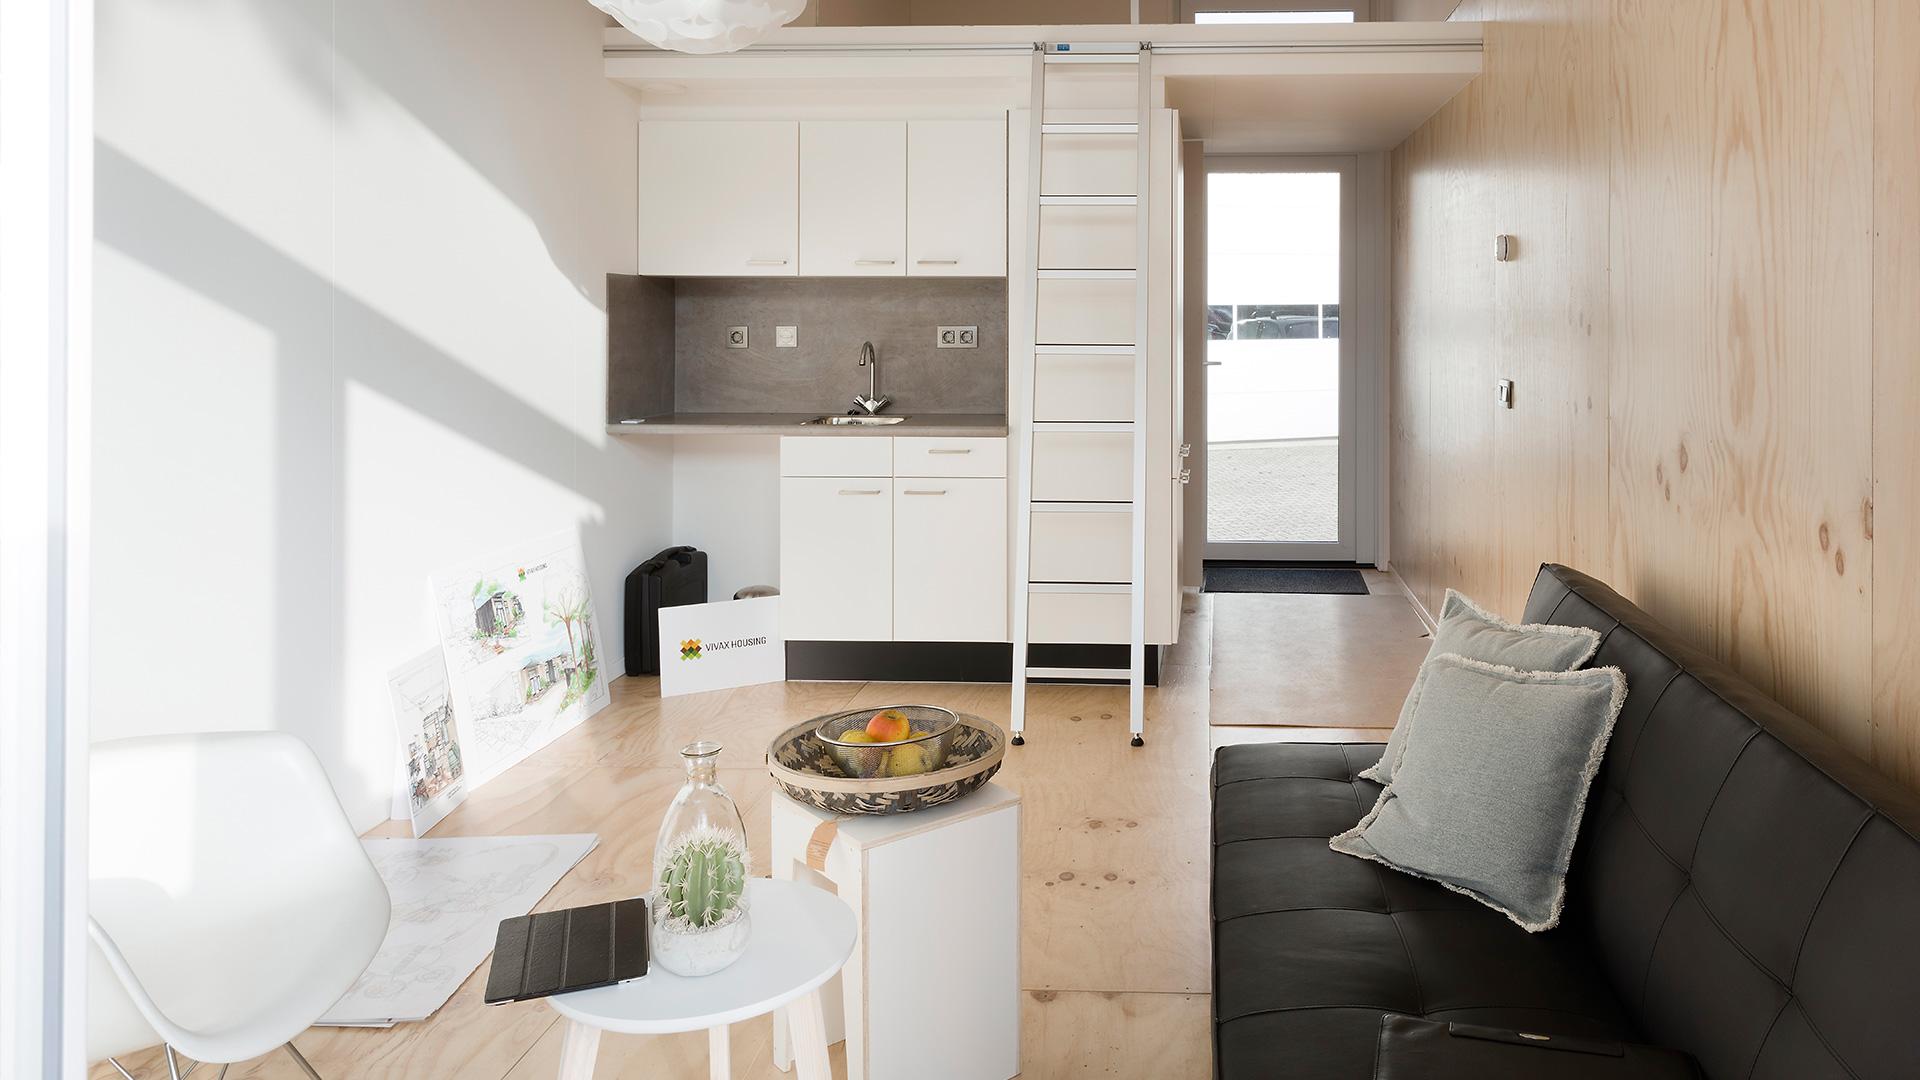 Bribus_Samenwerking met Vivax housing